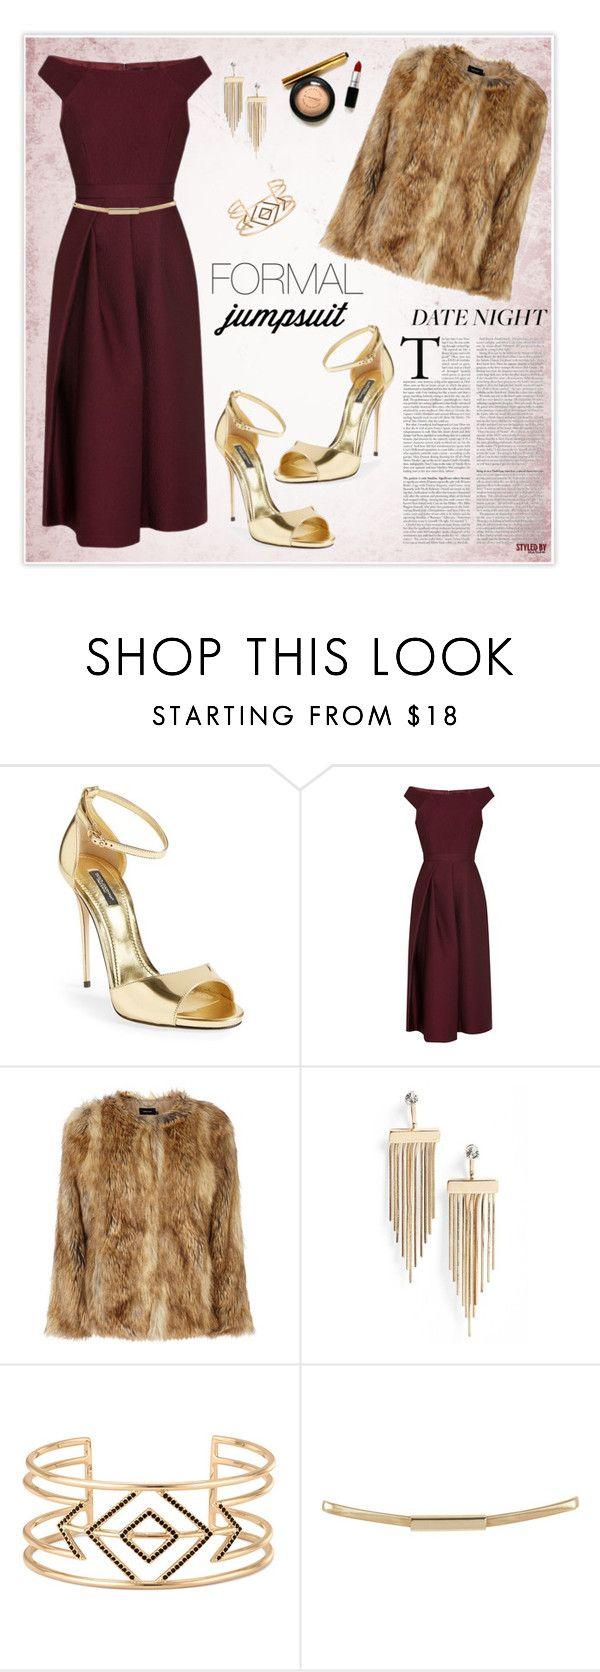 """Date Night: Jumpsuit Style"" by marion-fashionista-diva-miller ❤ liked on Polyvore featuring moda, Dolce&Gabbana, TIBI, Karen Millen, Topshop, Stella & Dot, DateNight, jumpsuit, fur e goldsandals"